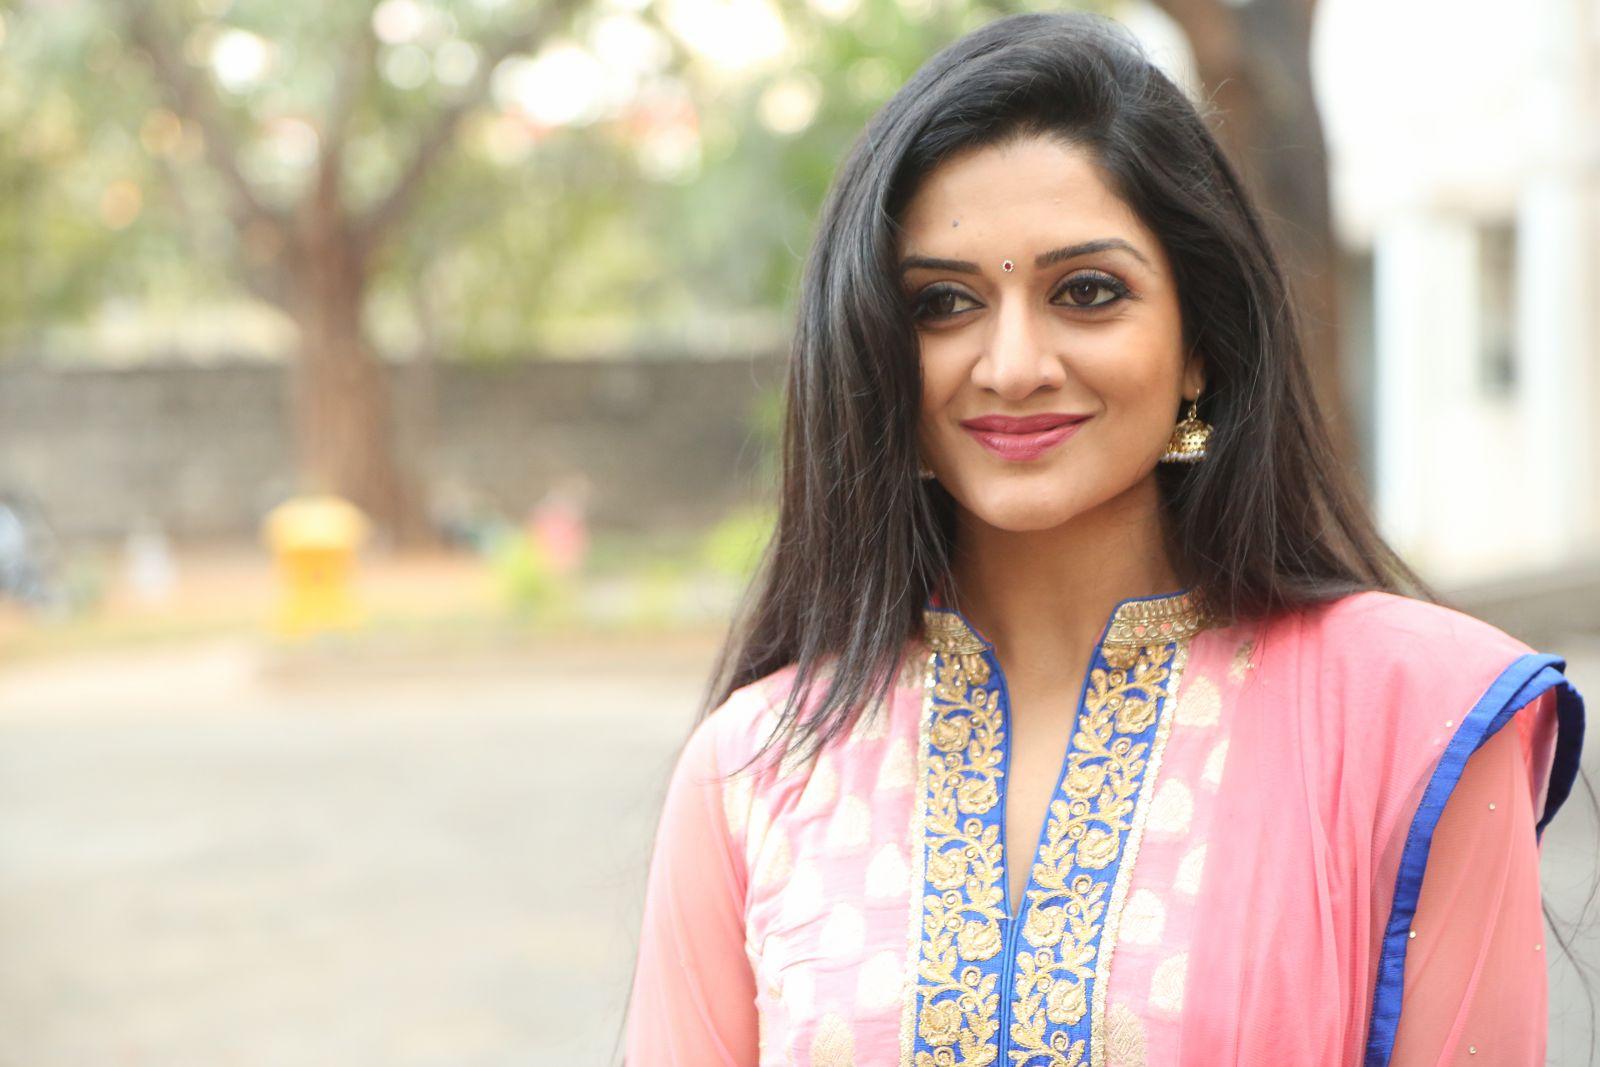 Brand New Photo Stills Of Beautiful Actress Vimala Raman | Film Industry